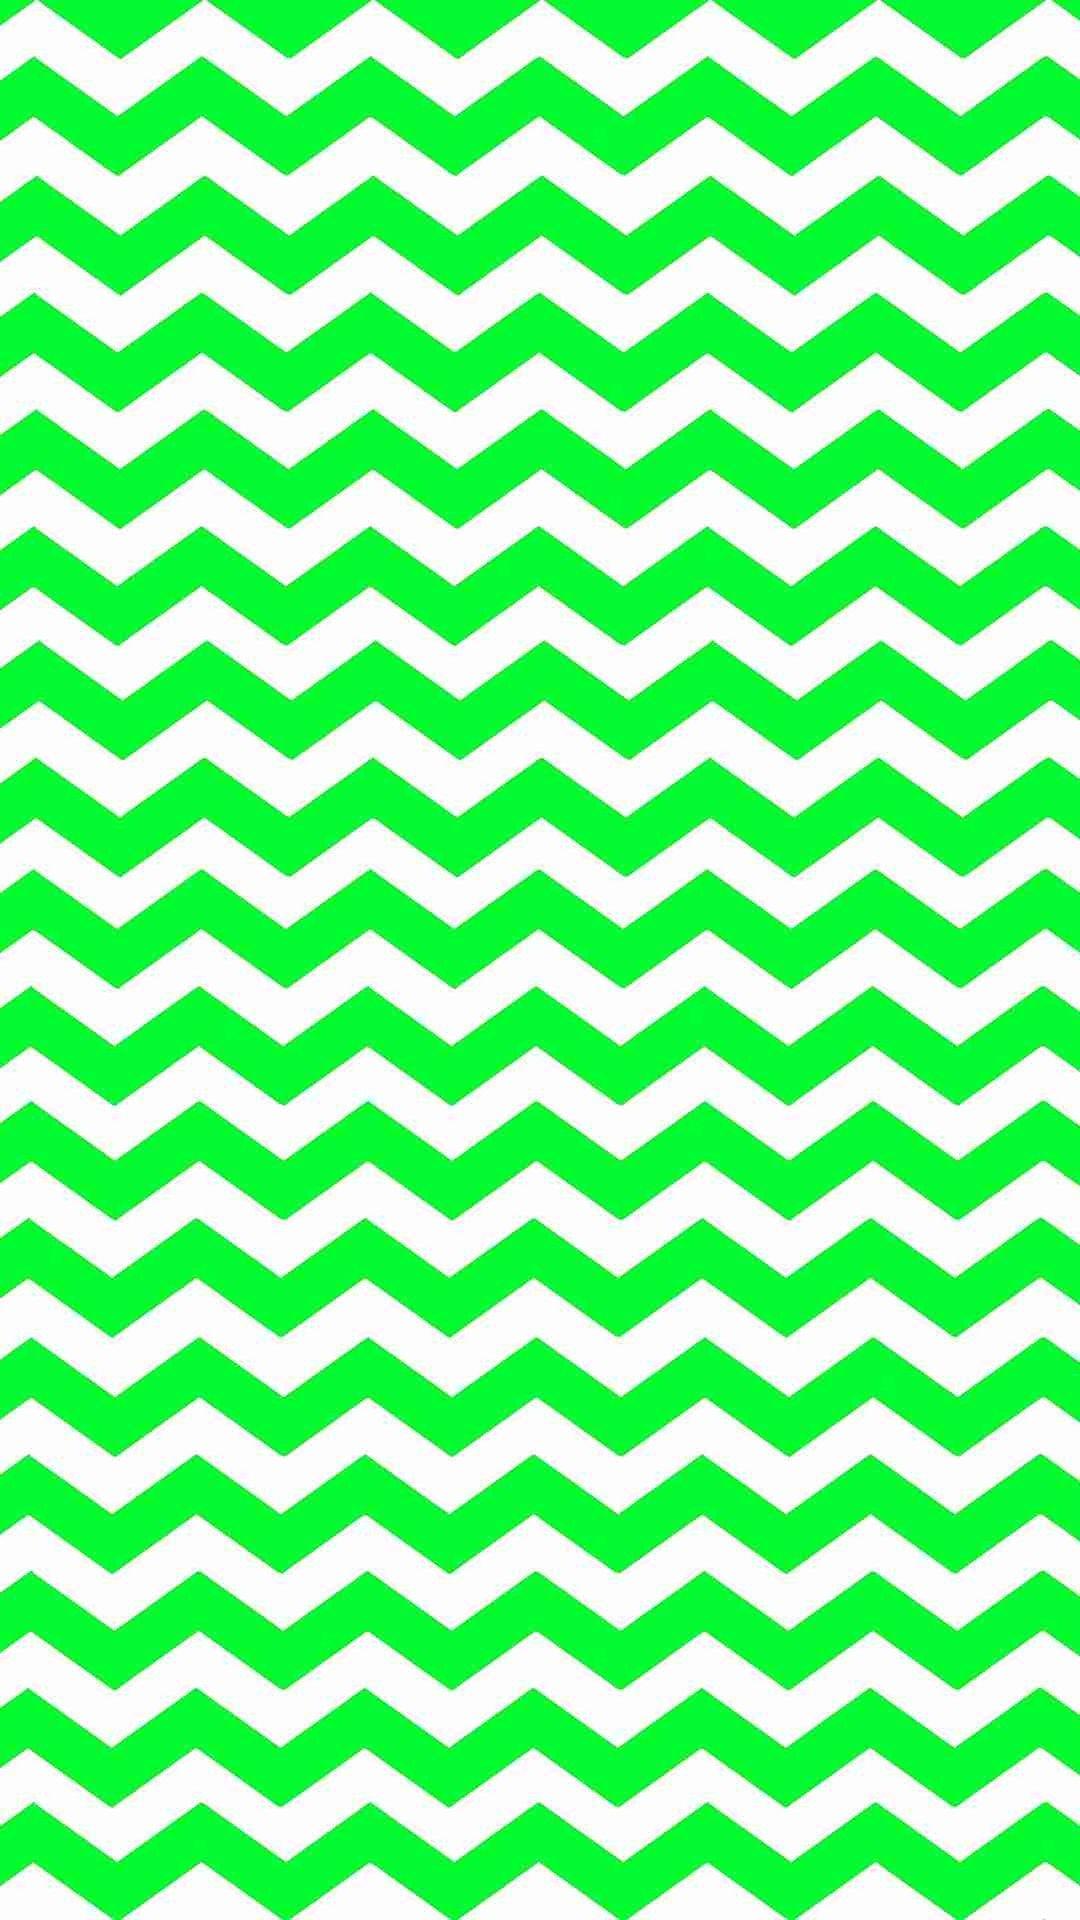 Eye Catching Green Zigzag Iphone 6 Plus Wallpaper